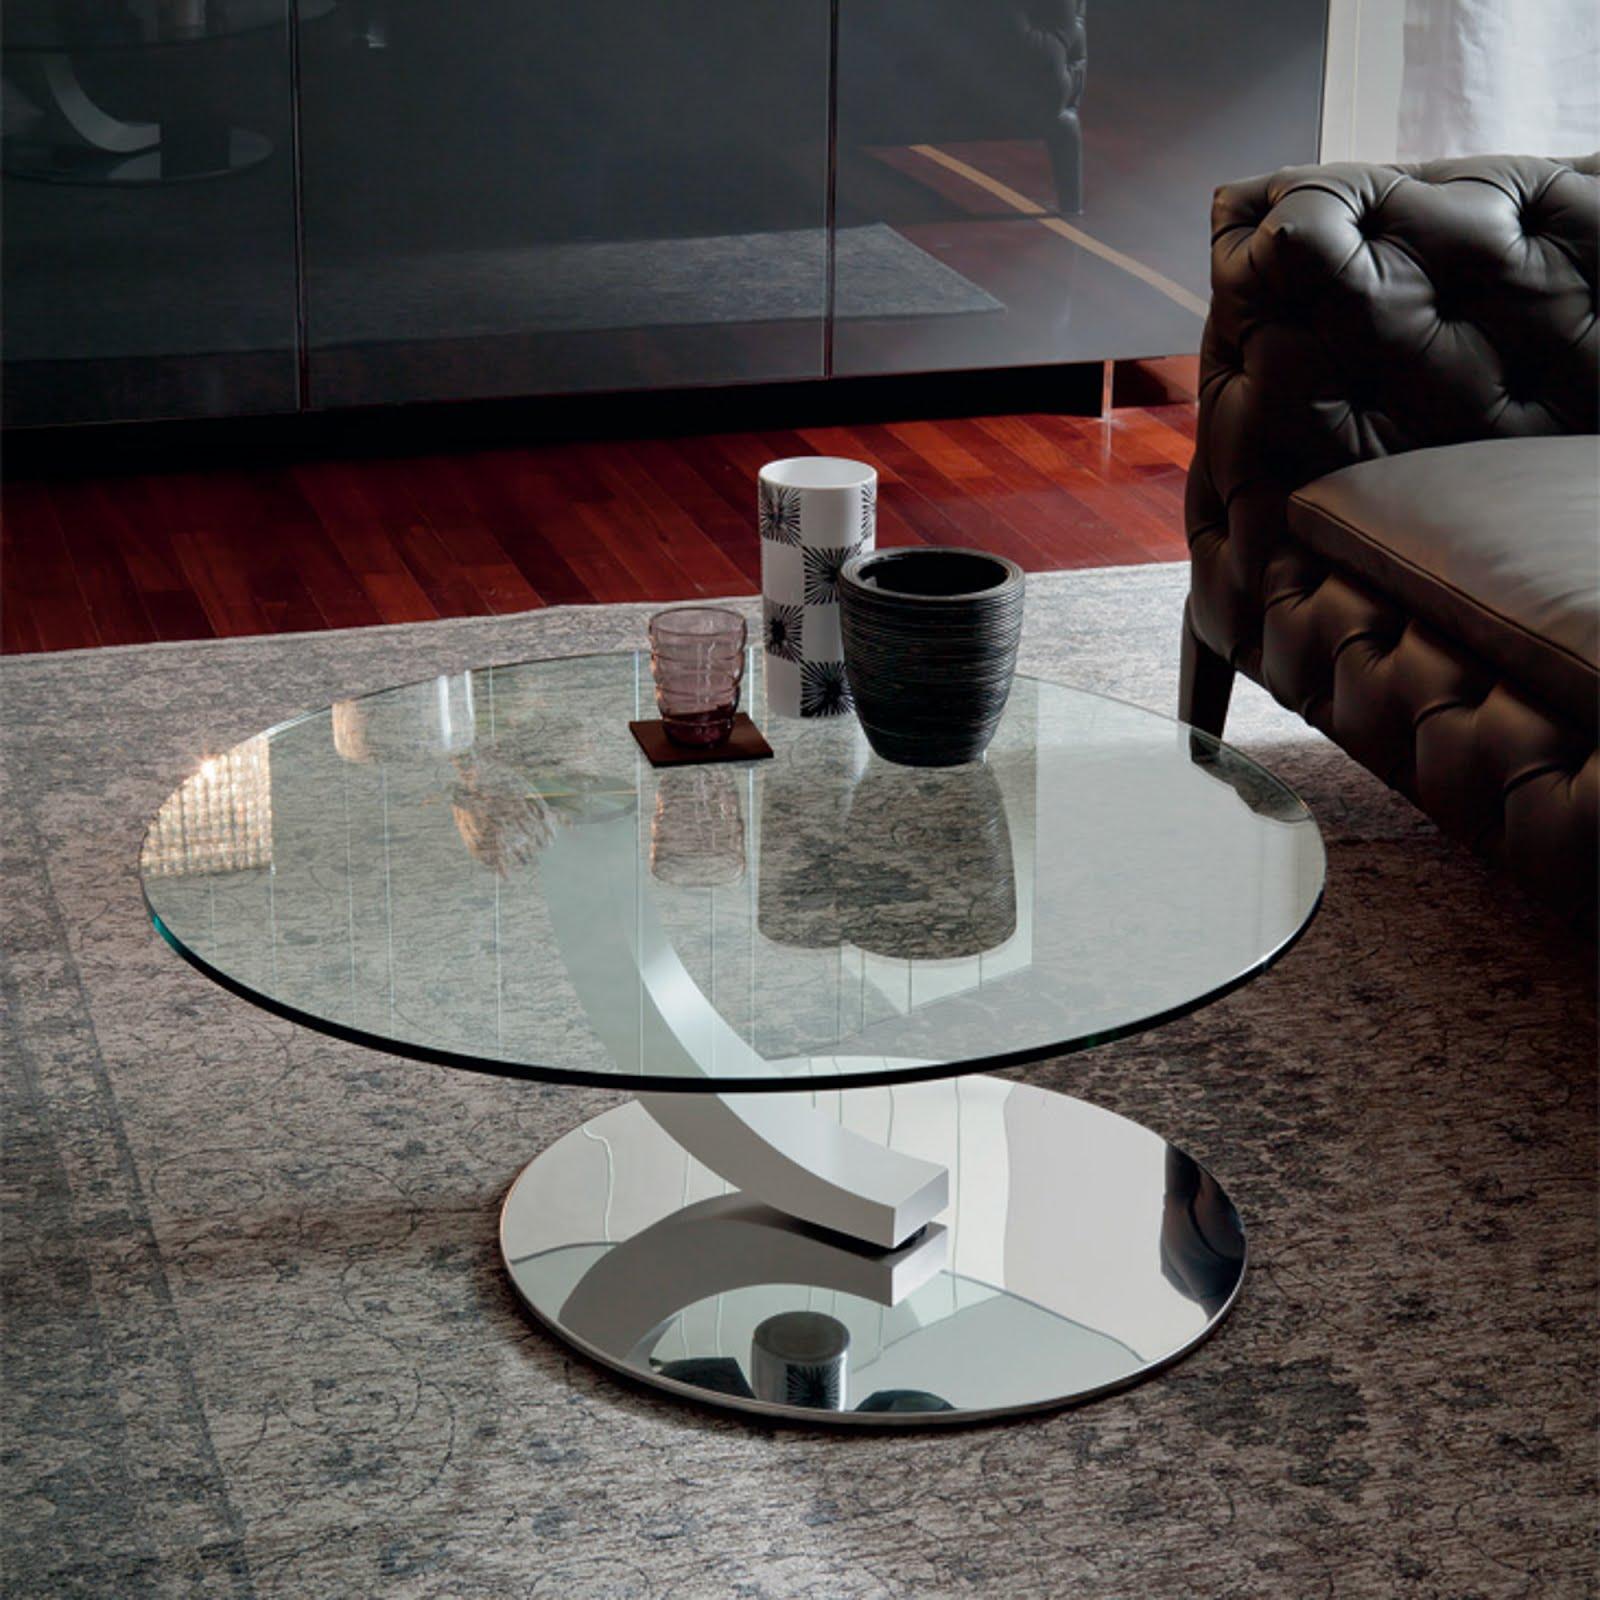 Coffee Table Cobra Inox Cattelan Italia Italian Furniture - The-cattelan-italias-spiral-was-designed-by-ca-nova-design